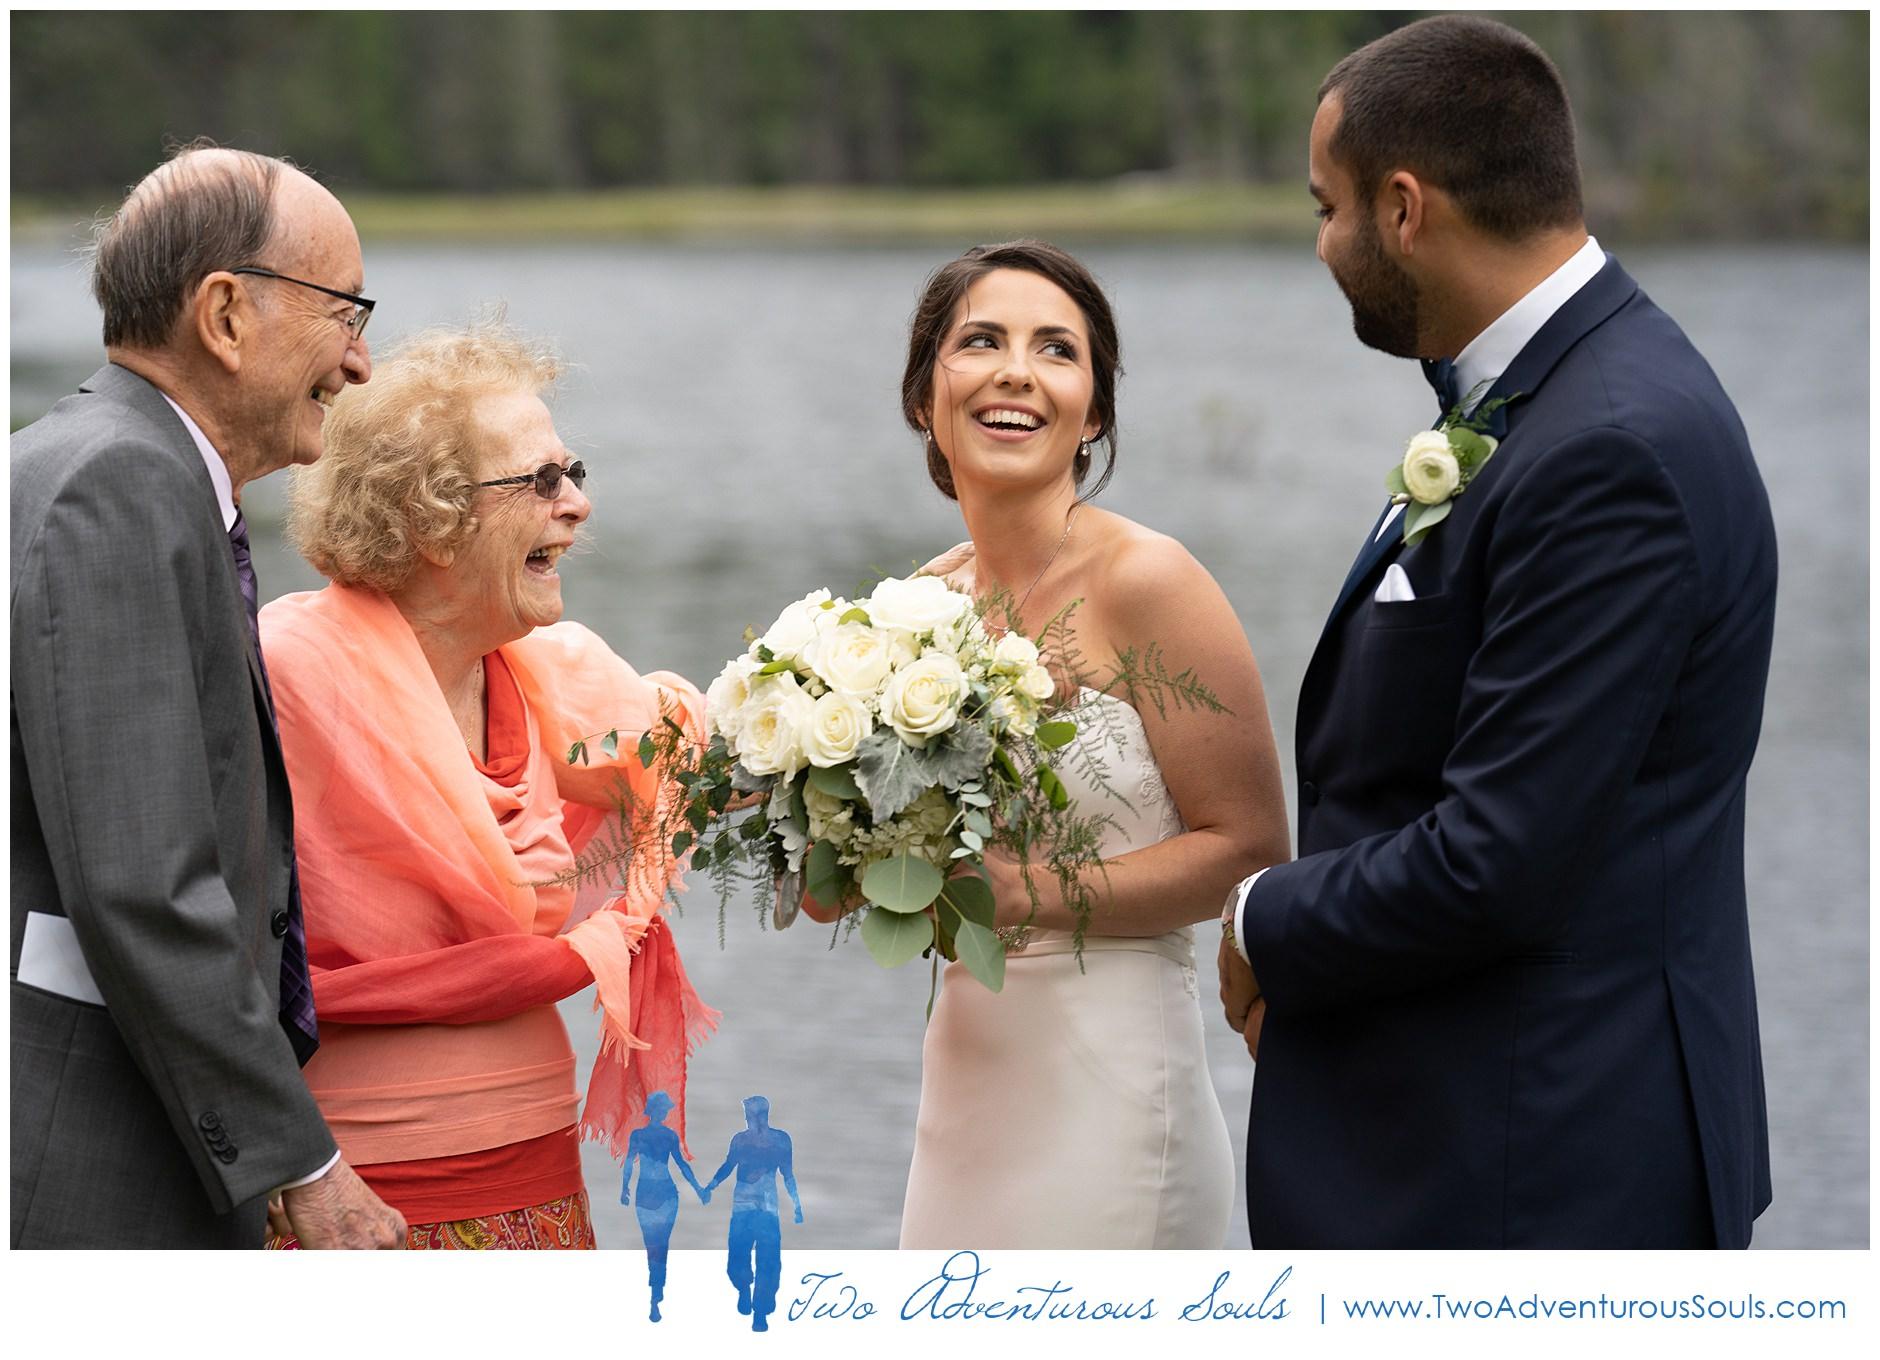 Sugarloaf Outdoor Center Wedding Photographers, Destination Wedding Photographers, Two Adventurous Souls-081719_0045.jpg